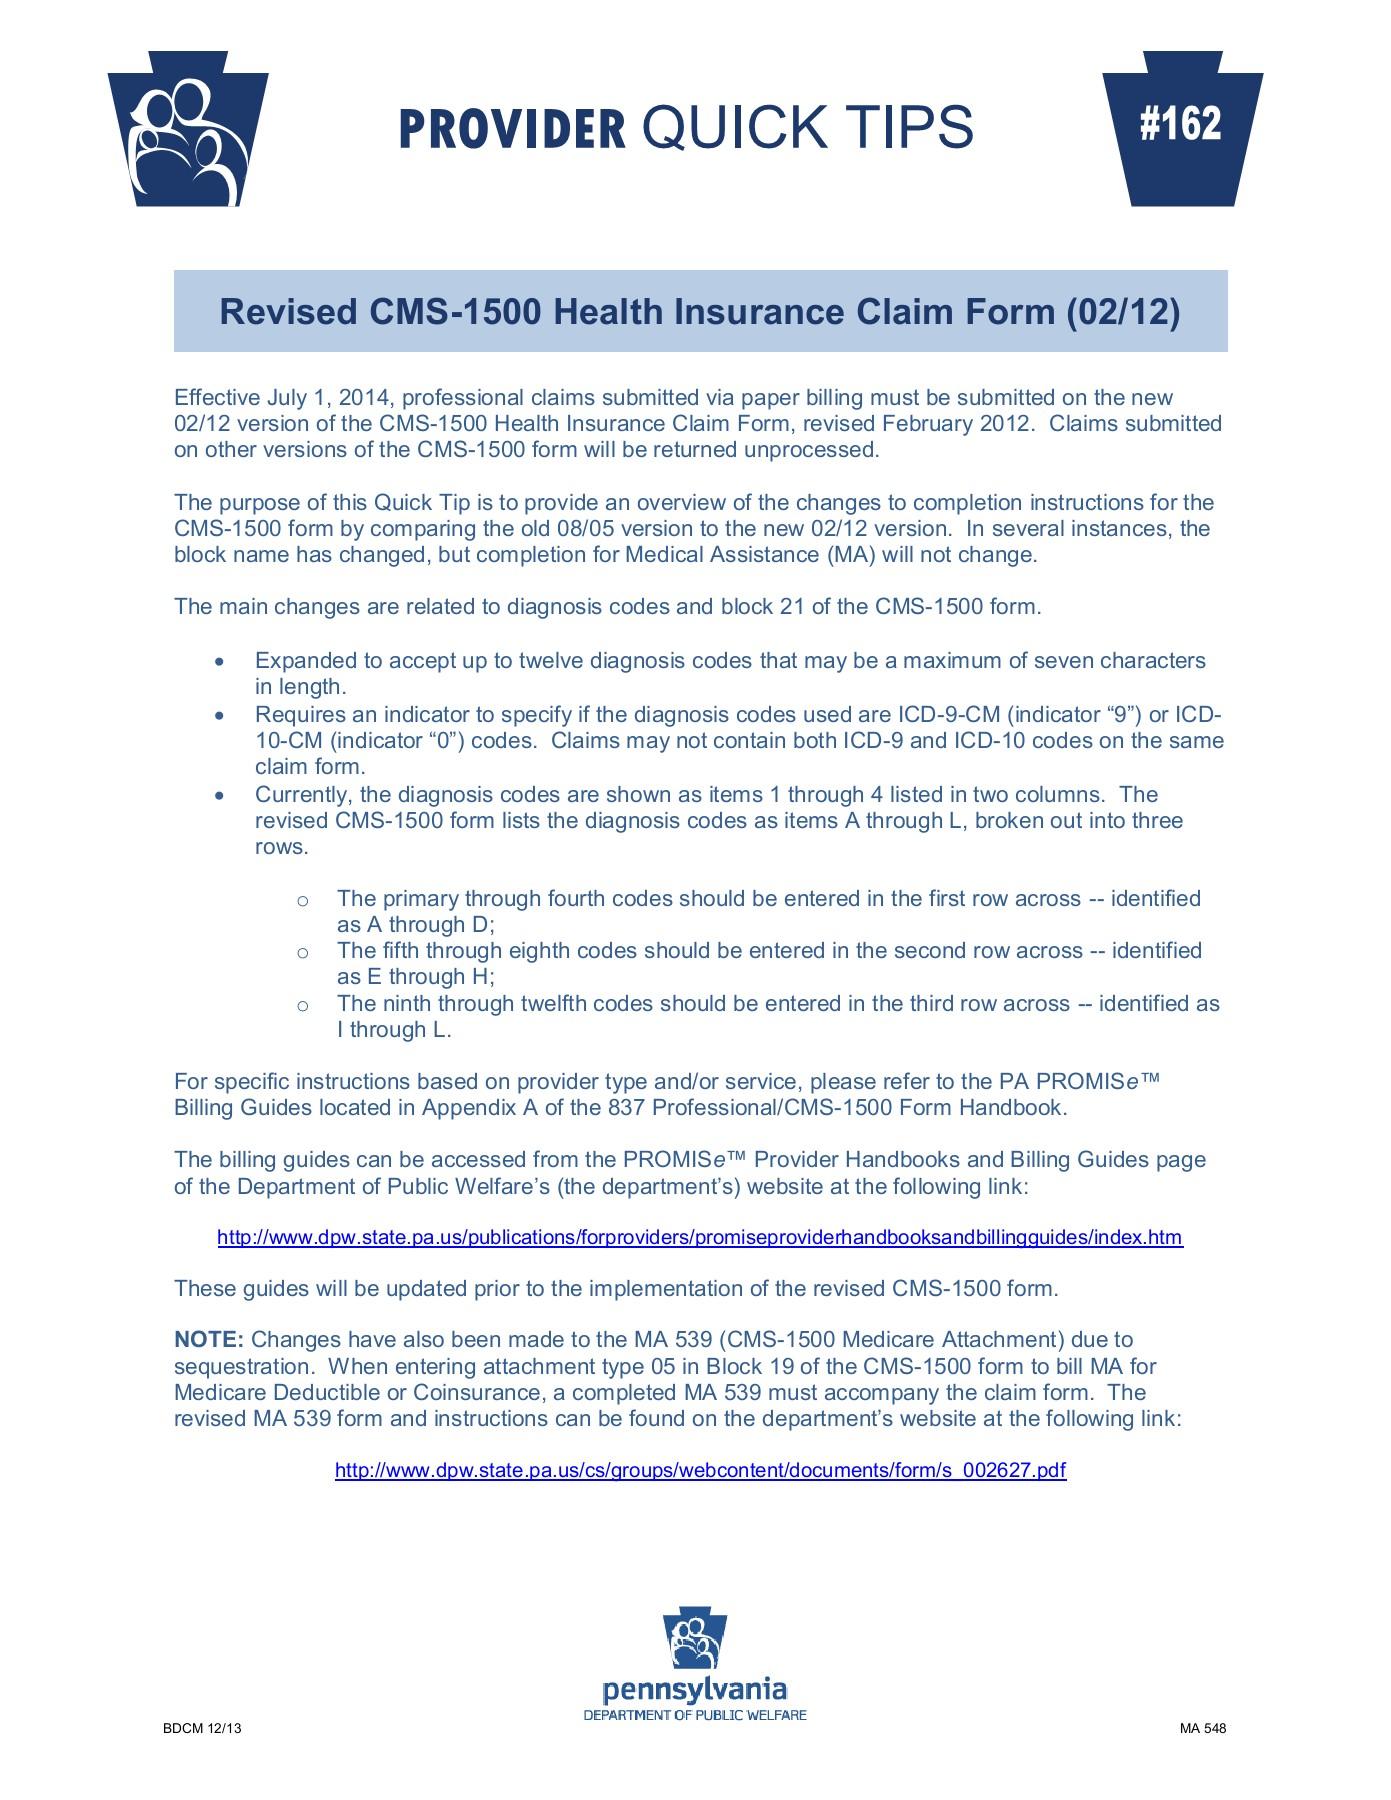 Revised Cms 1500 Claim Form 2012